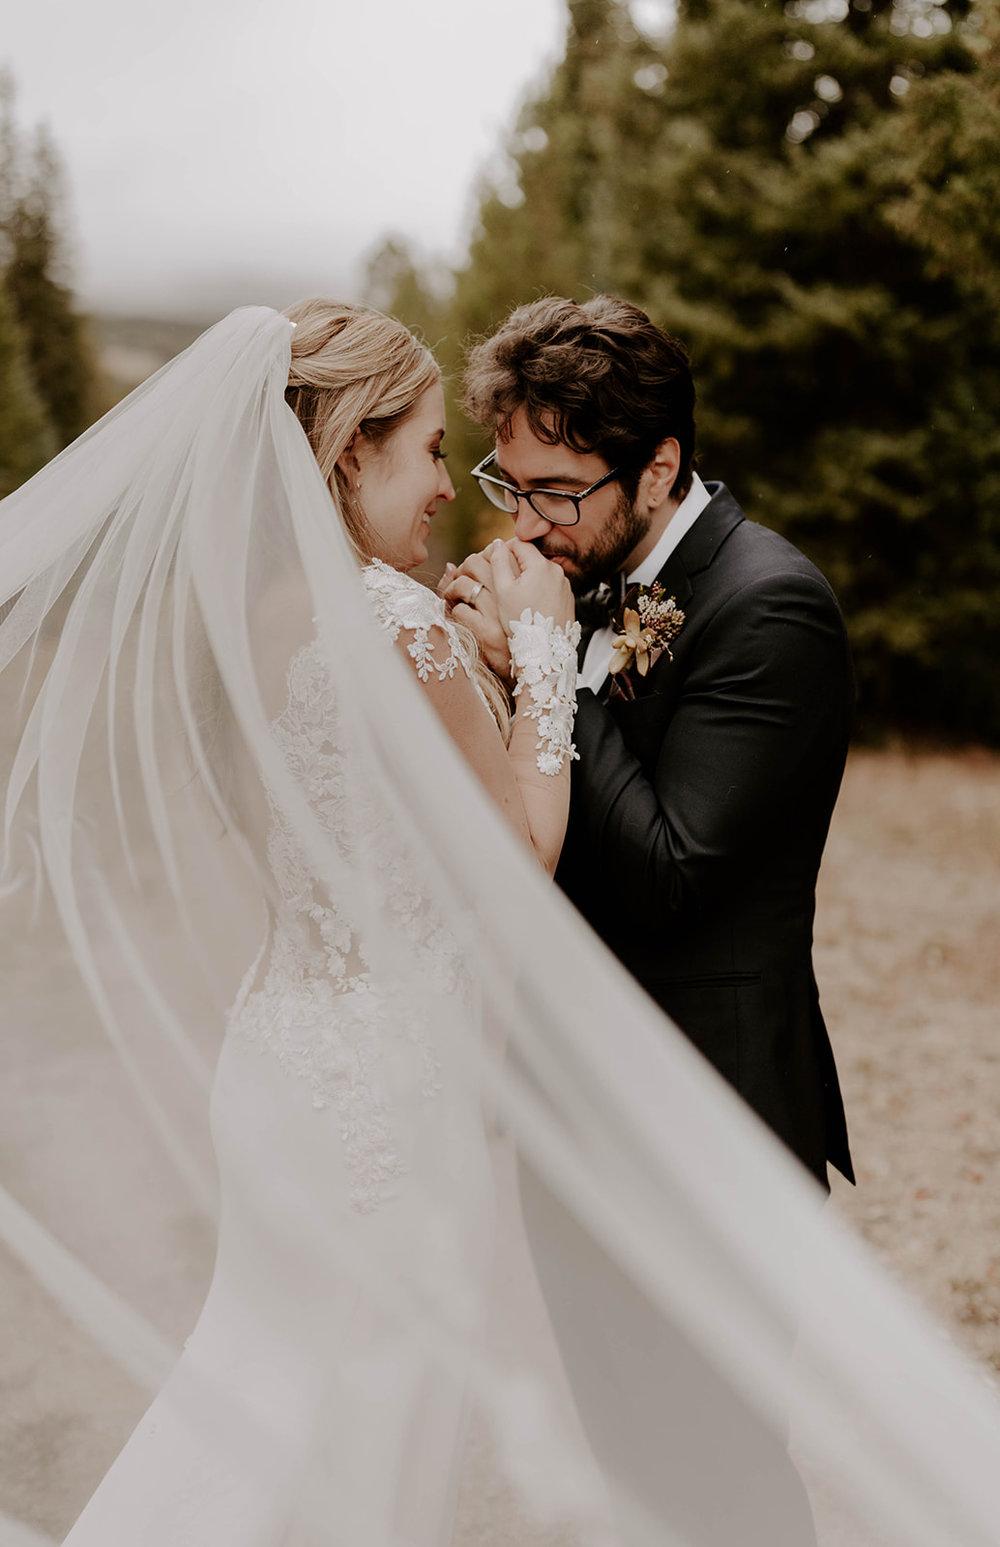 karra leigh photography- jenny and julio wedding822.jpg